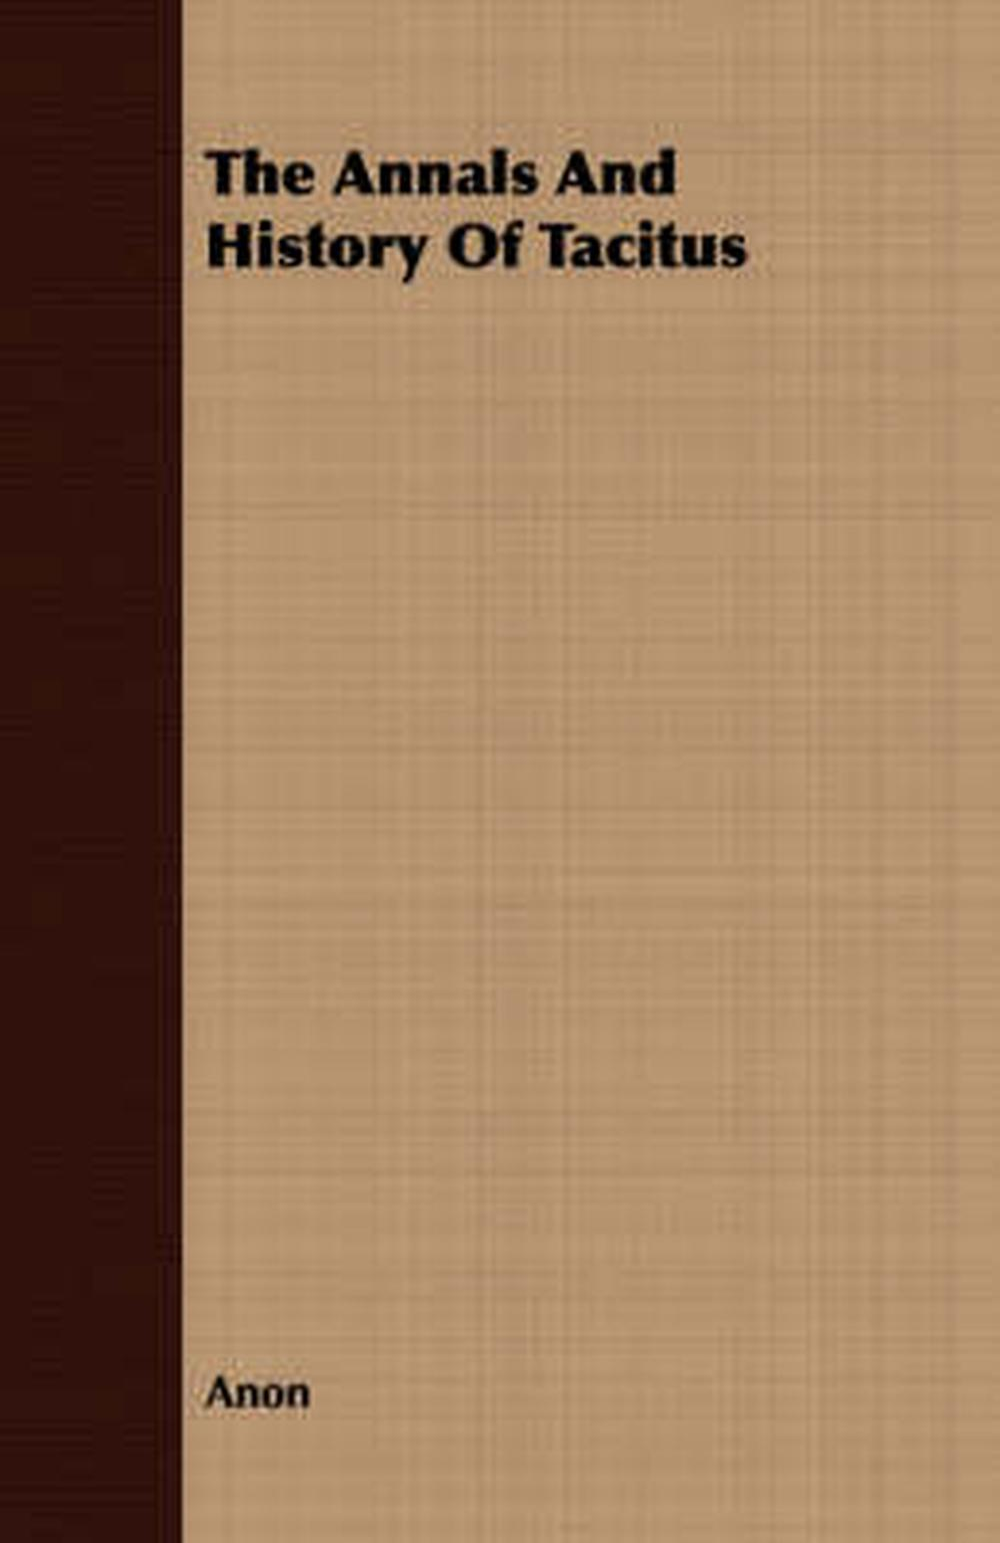 frederick douglass benjamin franklin and ralph waldo emerson essay Ralph waldo emerson related essays: frederick douglass  slave trade barack obama benjamin franklin benjamin franklin flashcards bill clinton communication.